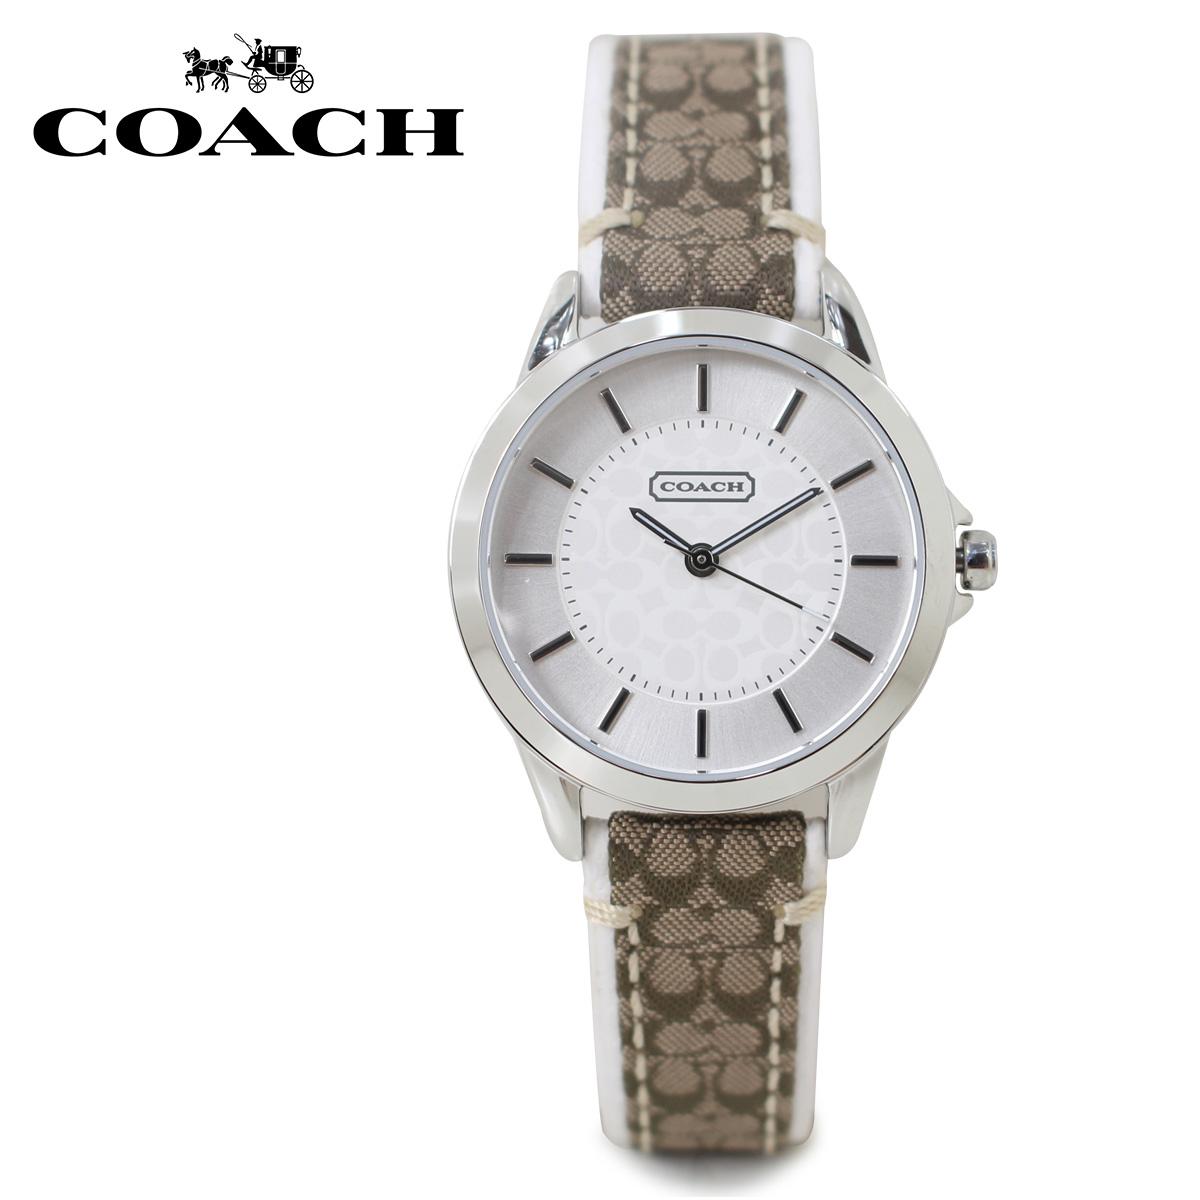 1c9b7ac4ca52 コーチCOACH腕時計レディースシグネチャーレザーブラウン14501526[5/22新入荷] ブーツ 激安人気商品